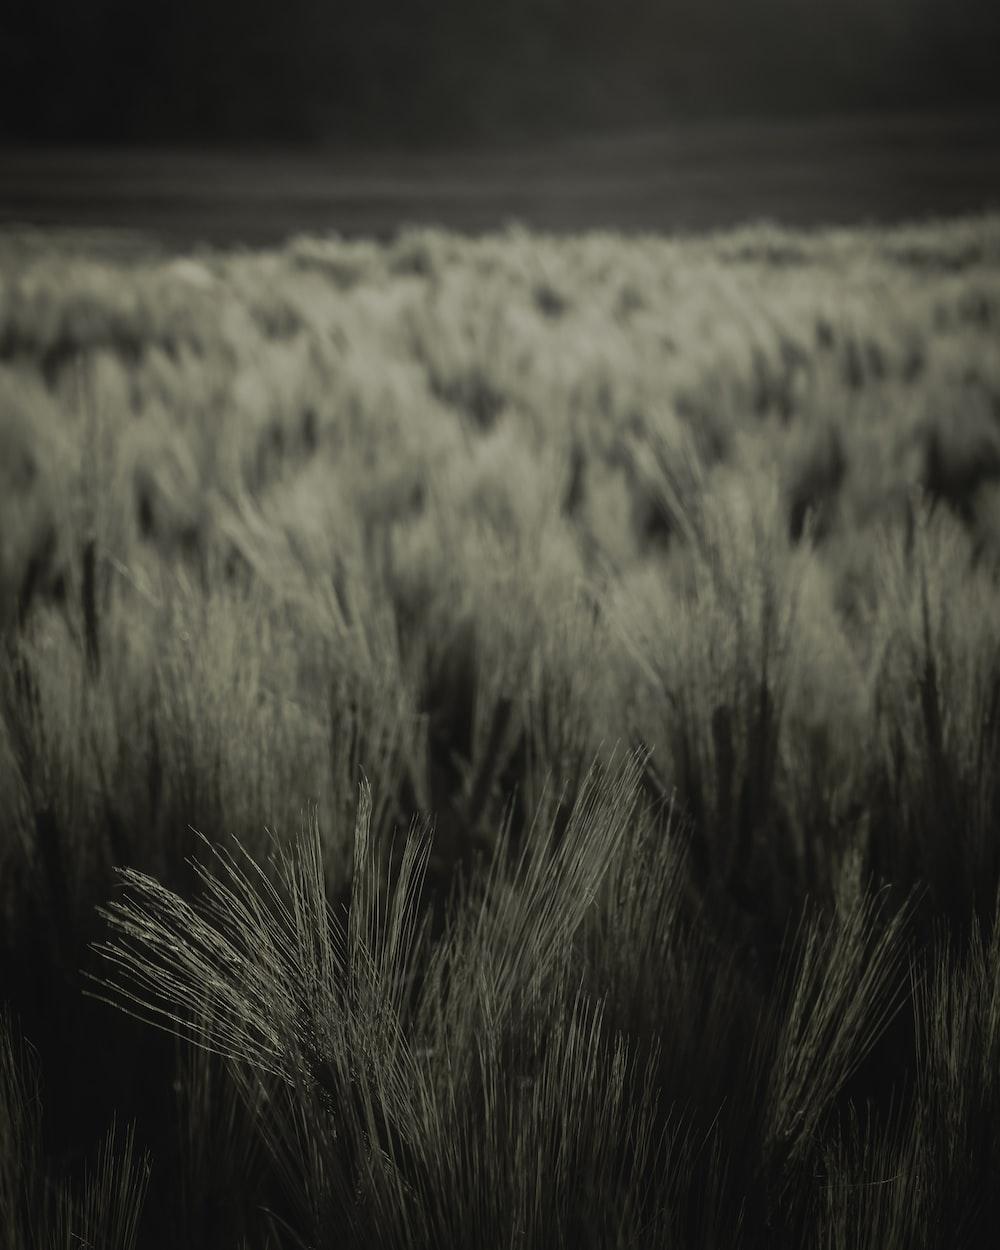 greyscale grass field photo